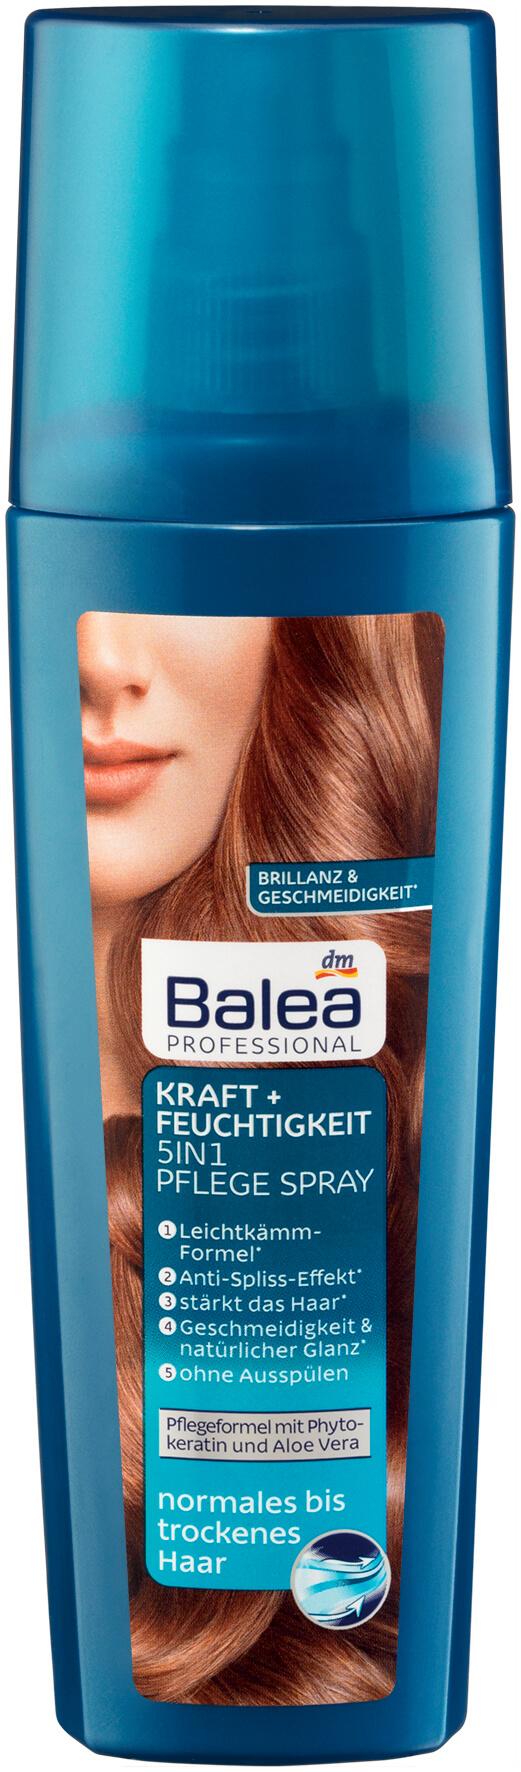 4010355236098_Balea_Kraft_Feuchtigkeit_Pflege_Spray